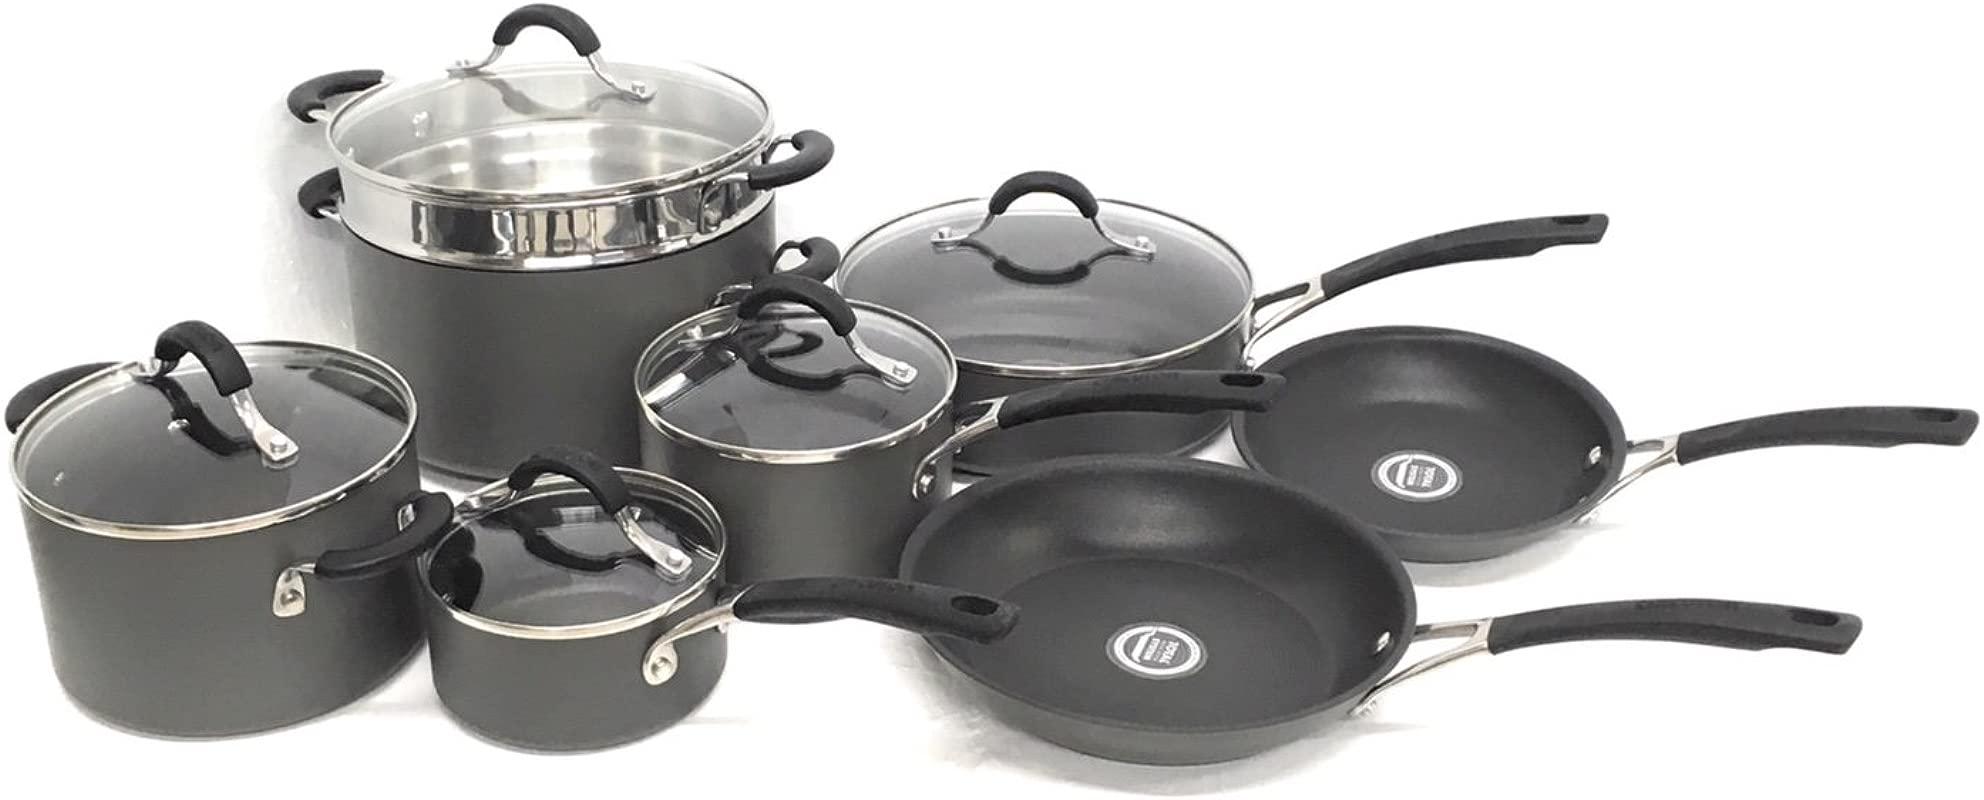 Circulon Innovatum Hard Anodized Nonstick 13 Piece Cookware Set